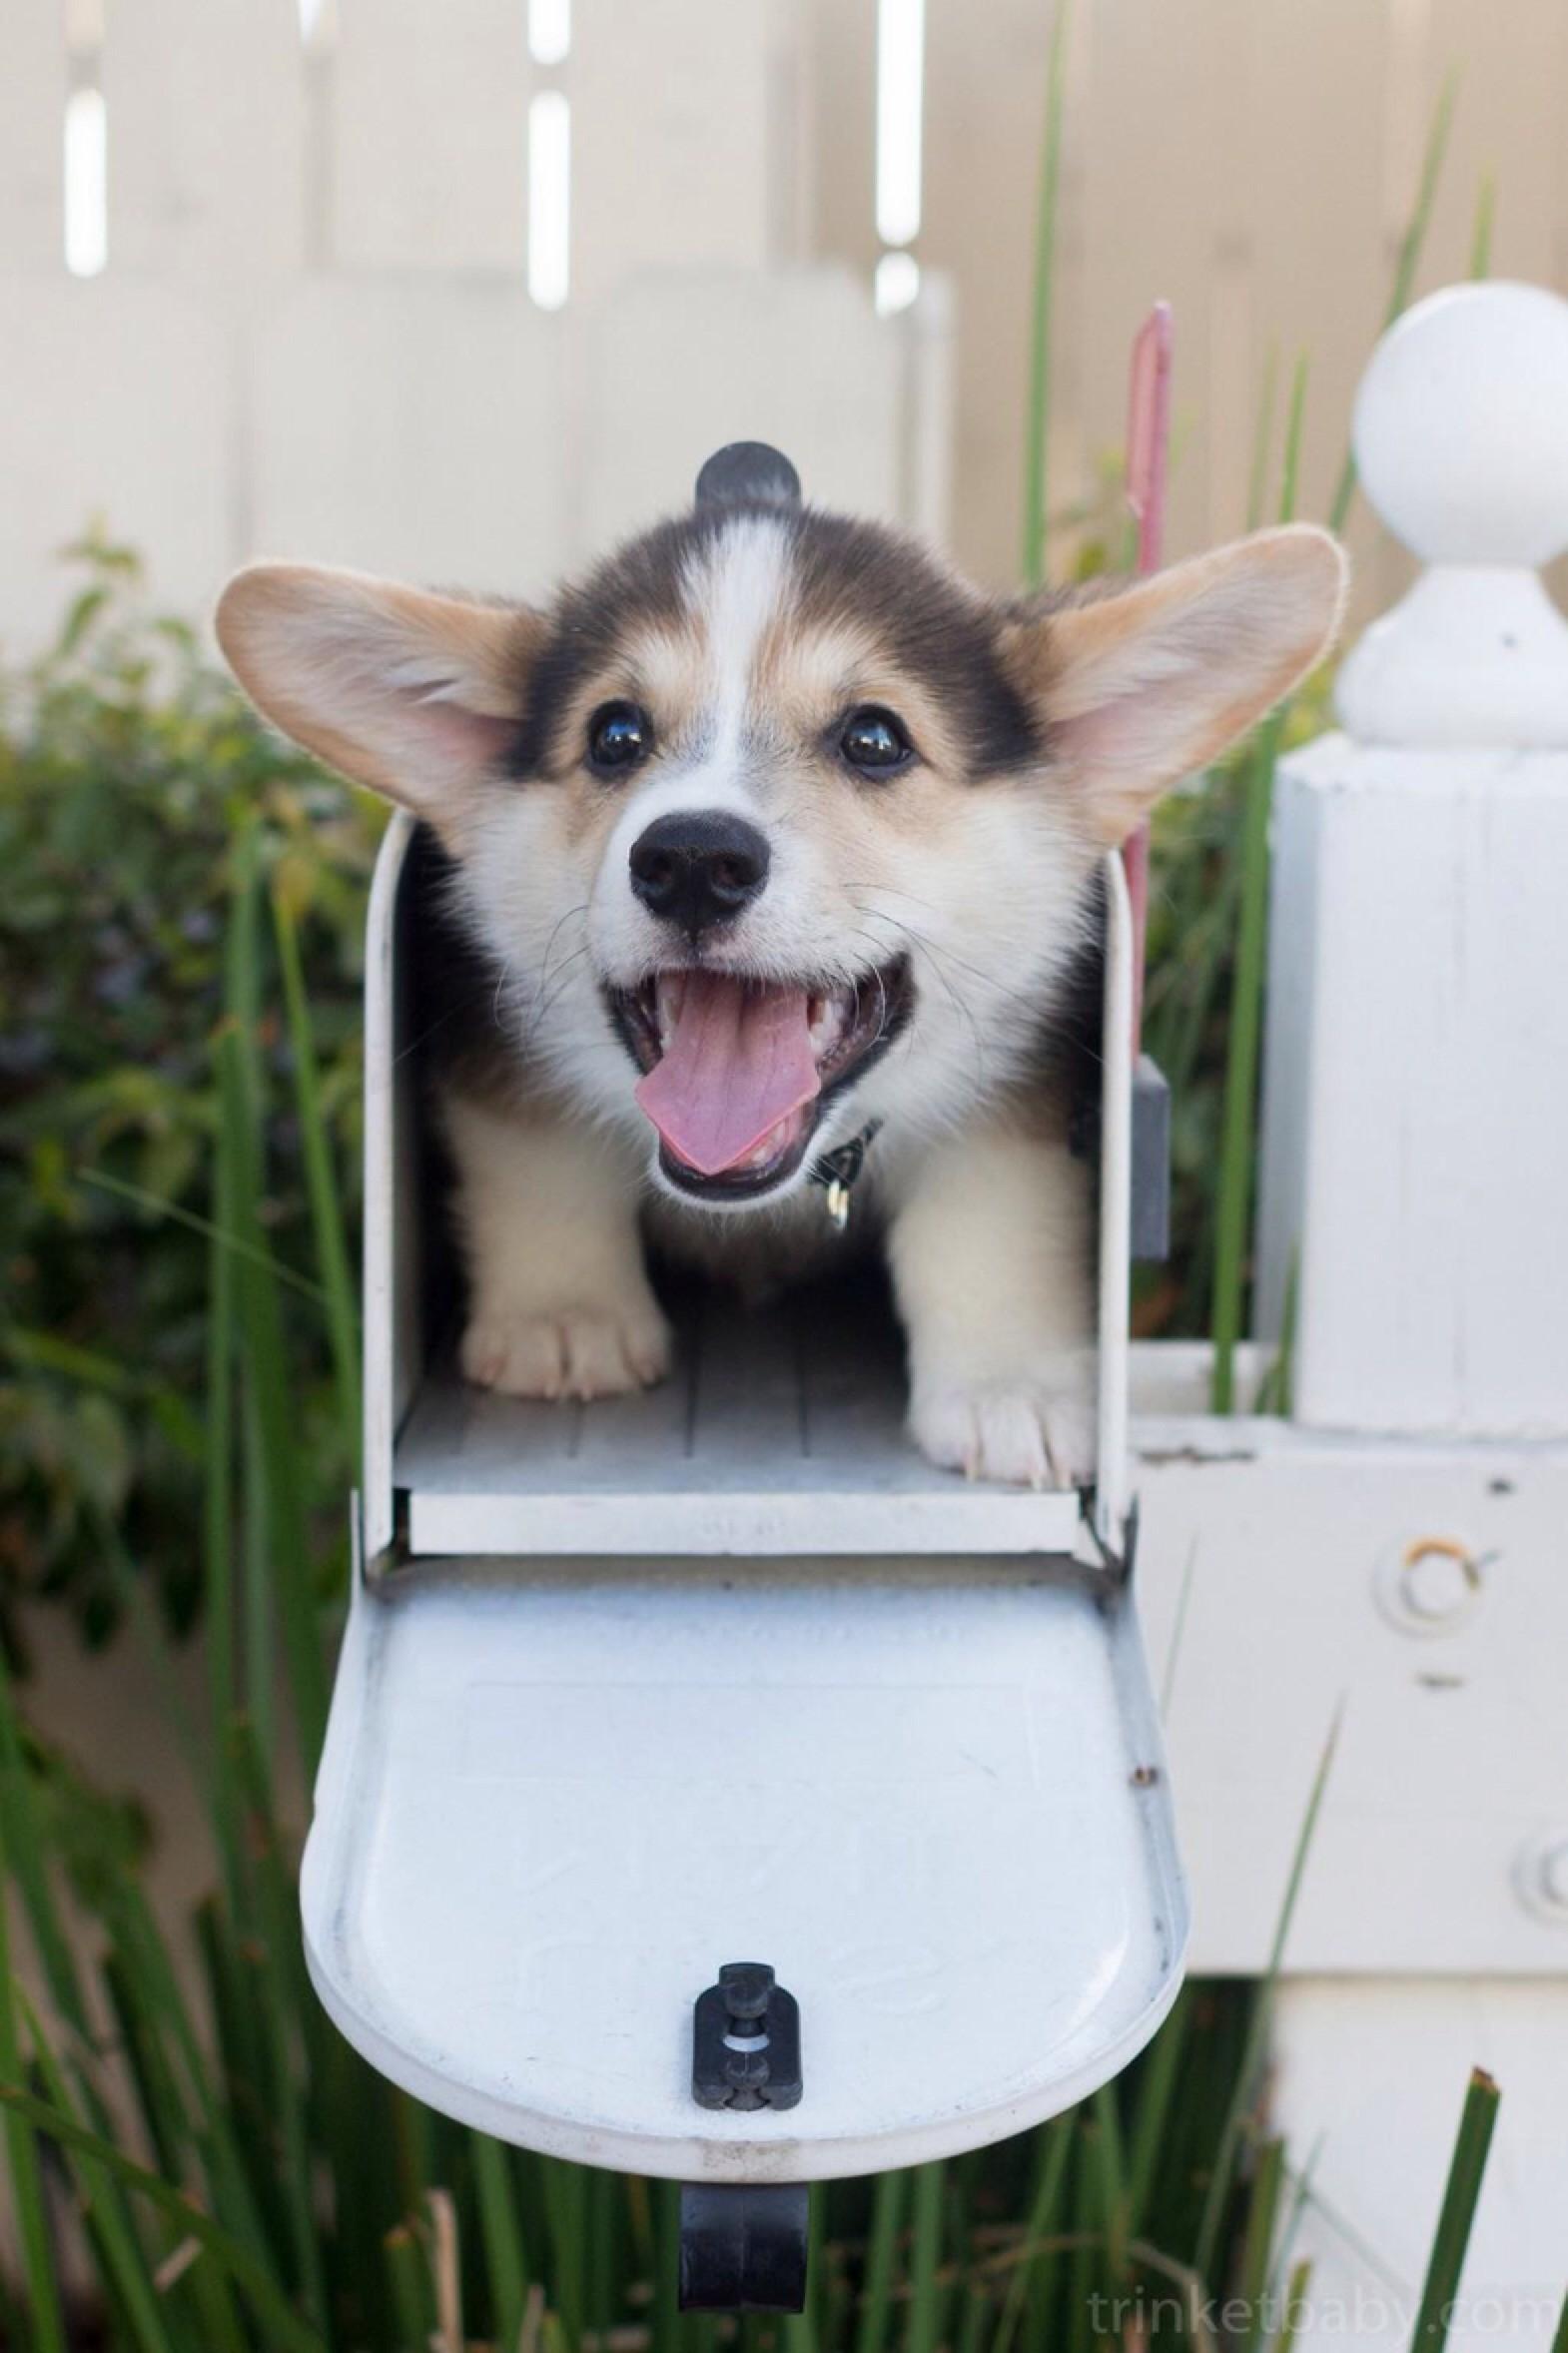 You got some mail! Jk. It's a puppy.